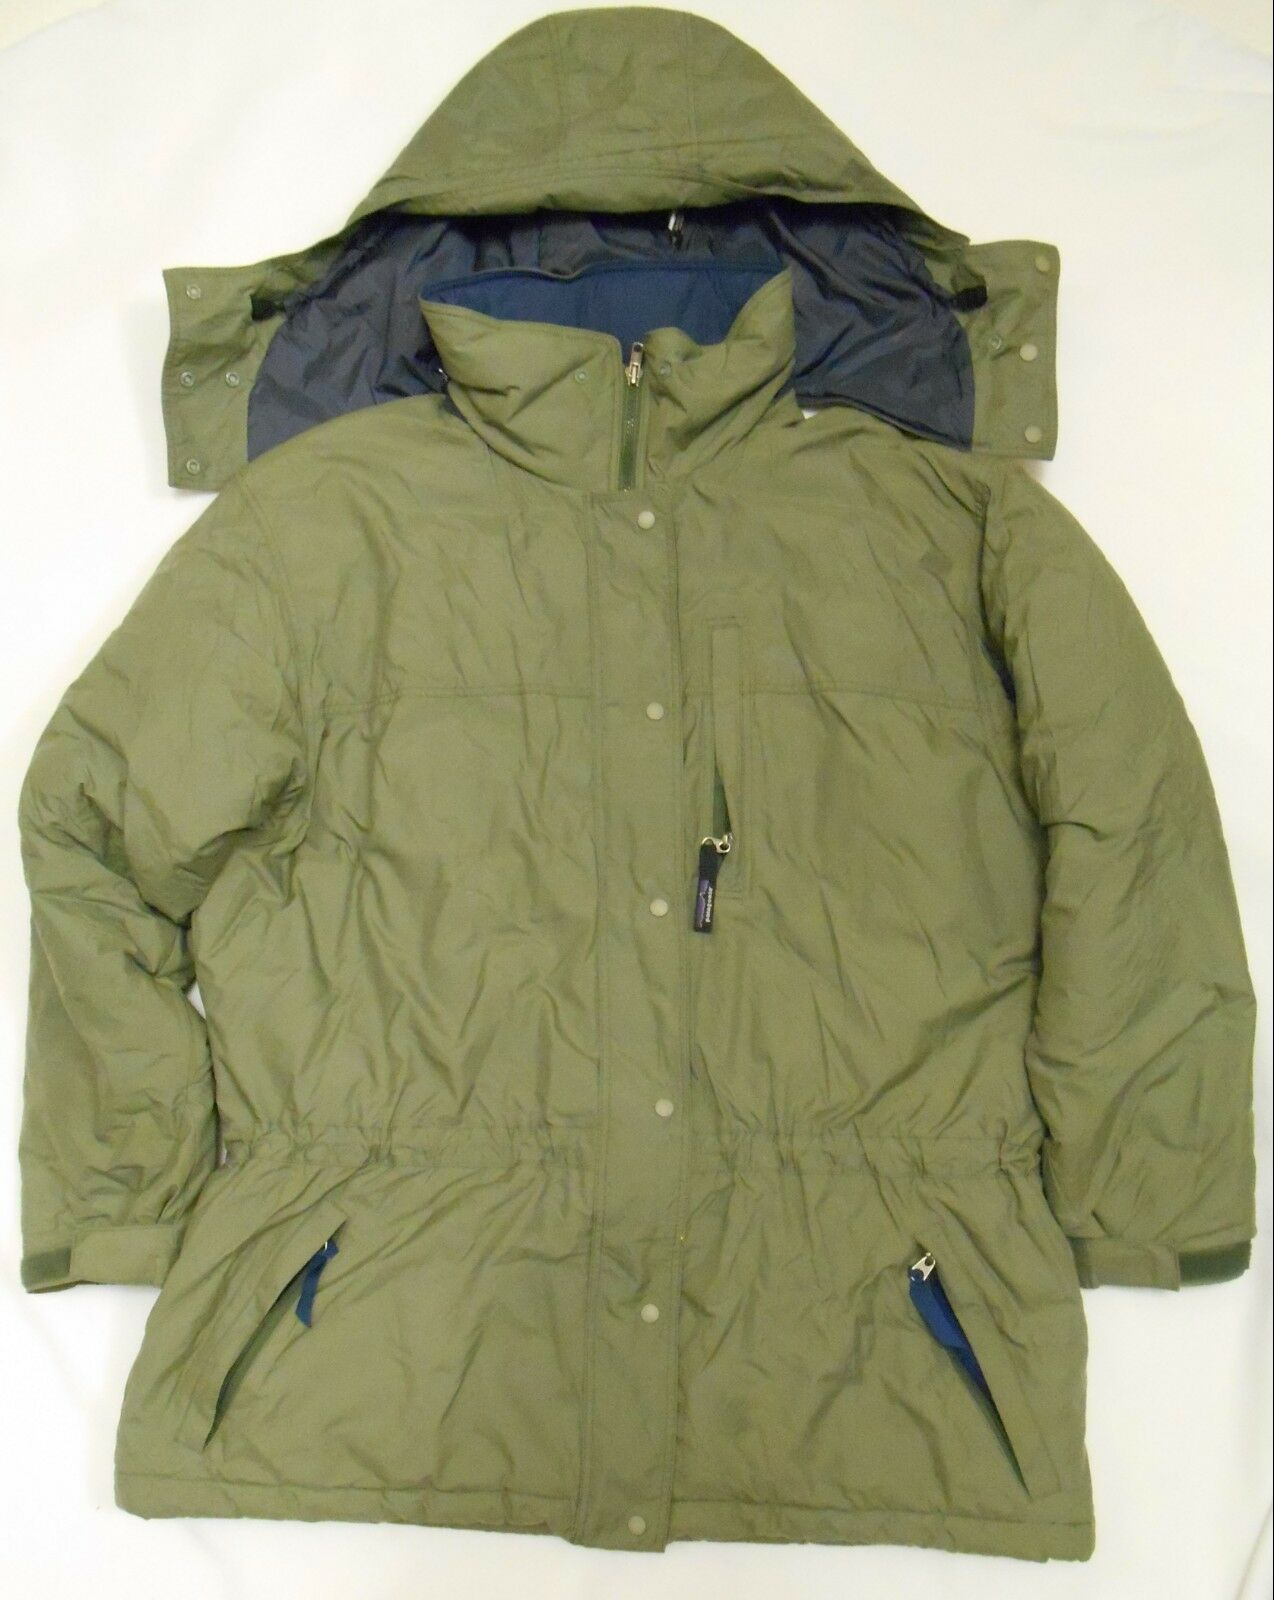 PATAGONIA Women's Vintage COAT Winter Ski Hooded Green Sz Large